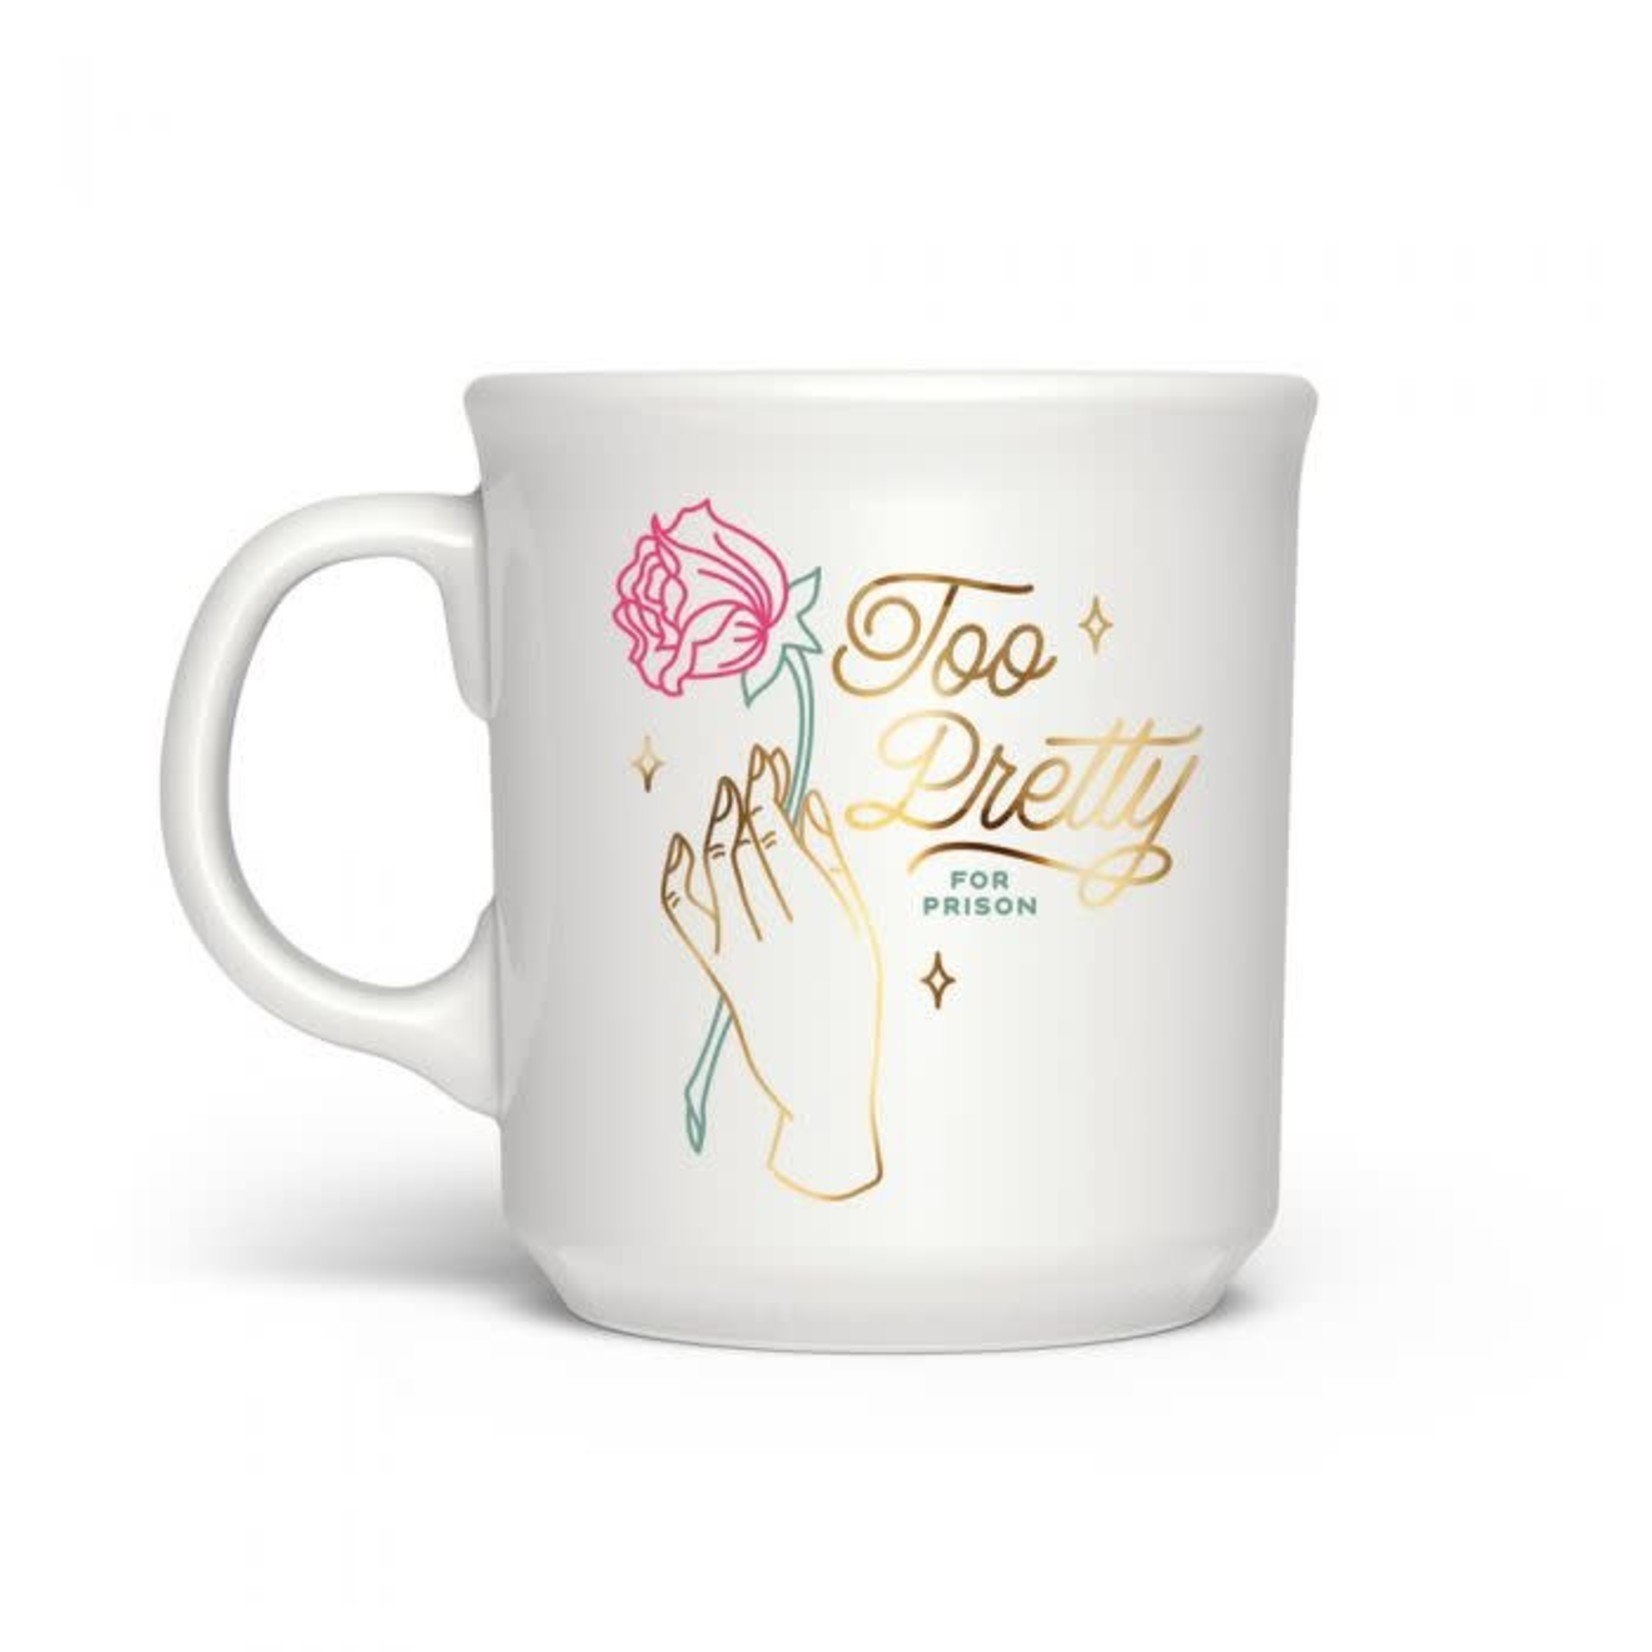 Mug - Too Pretty For Prison